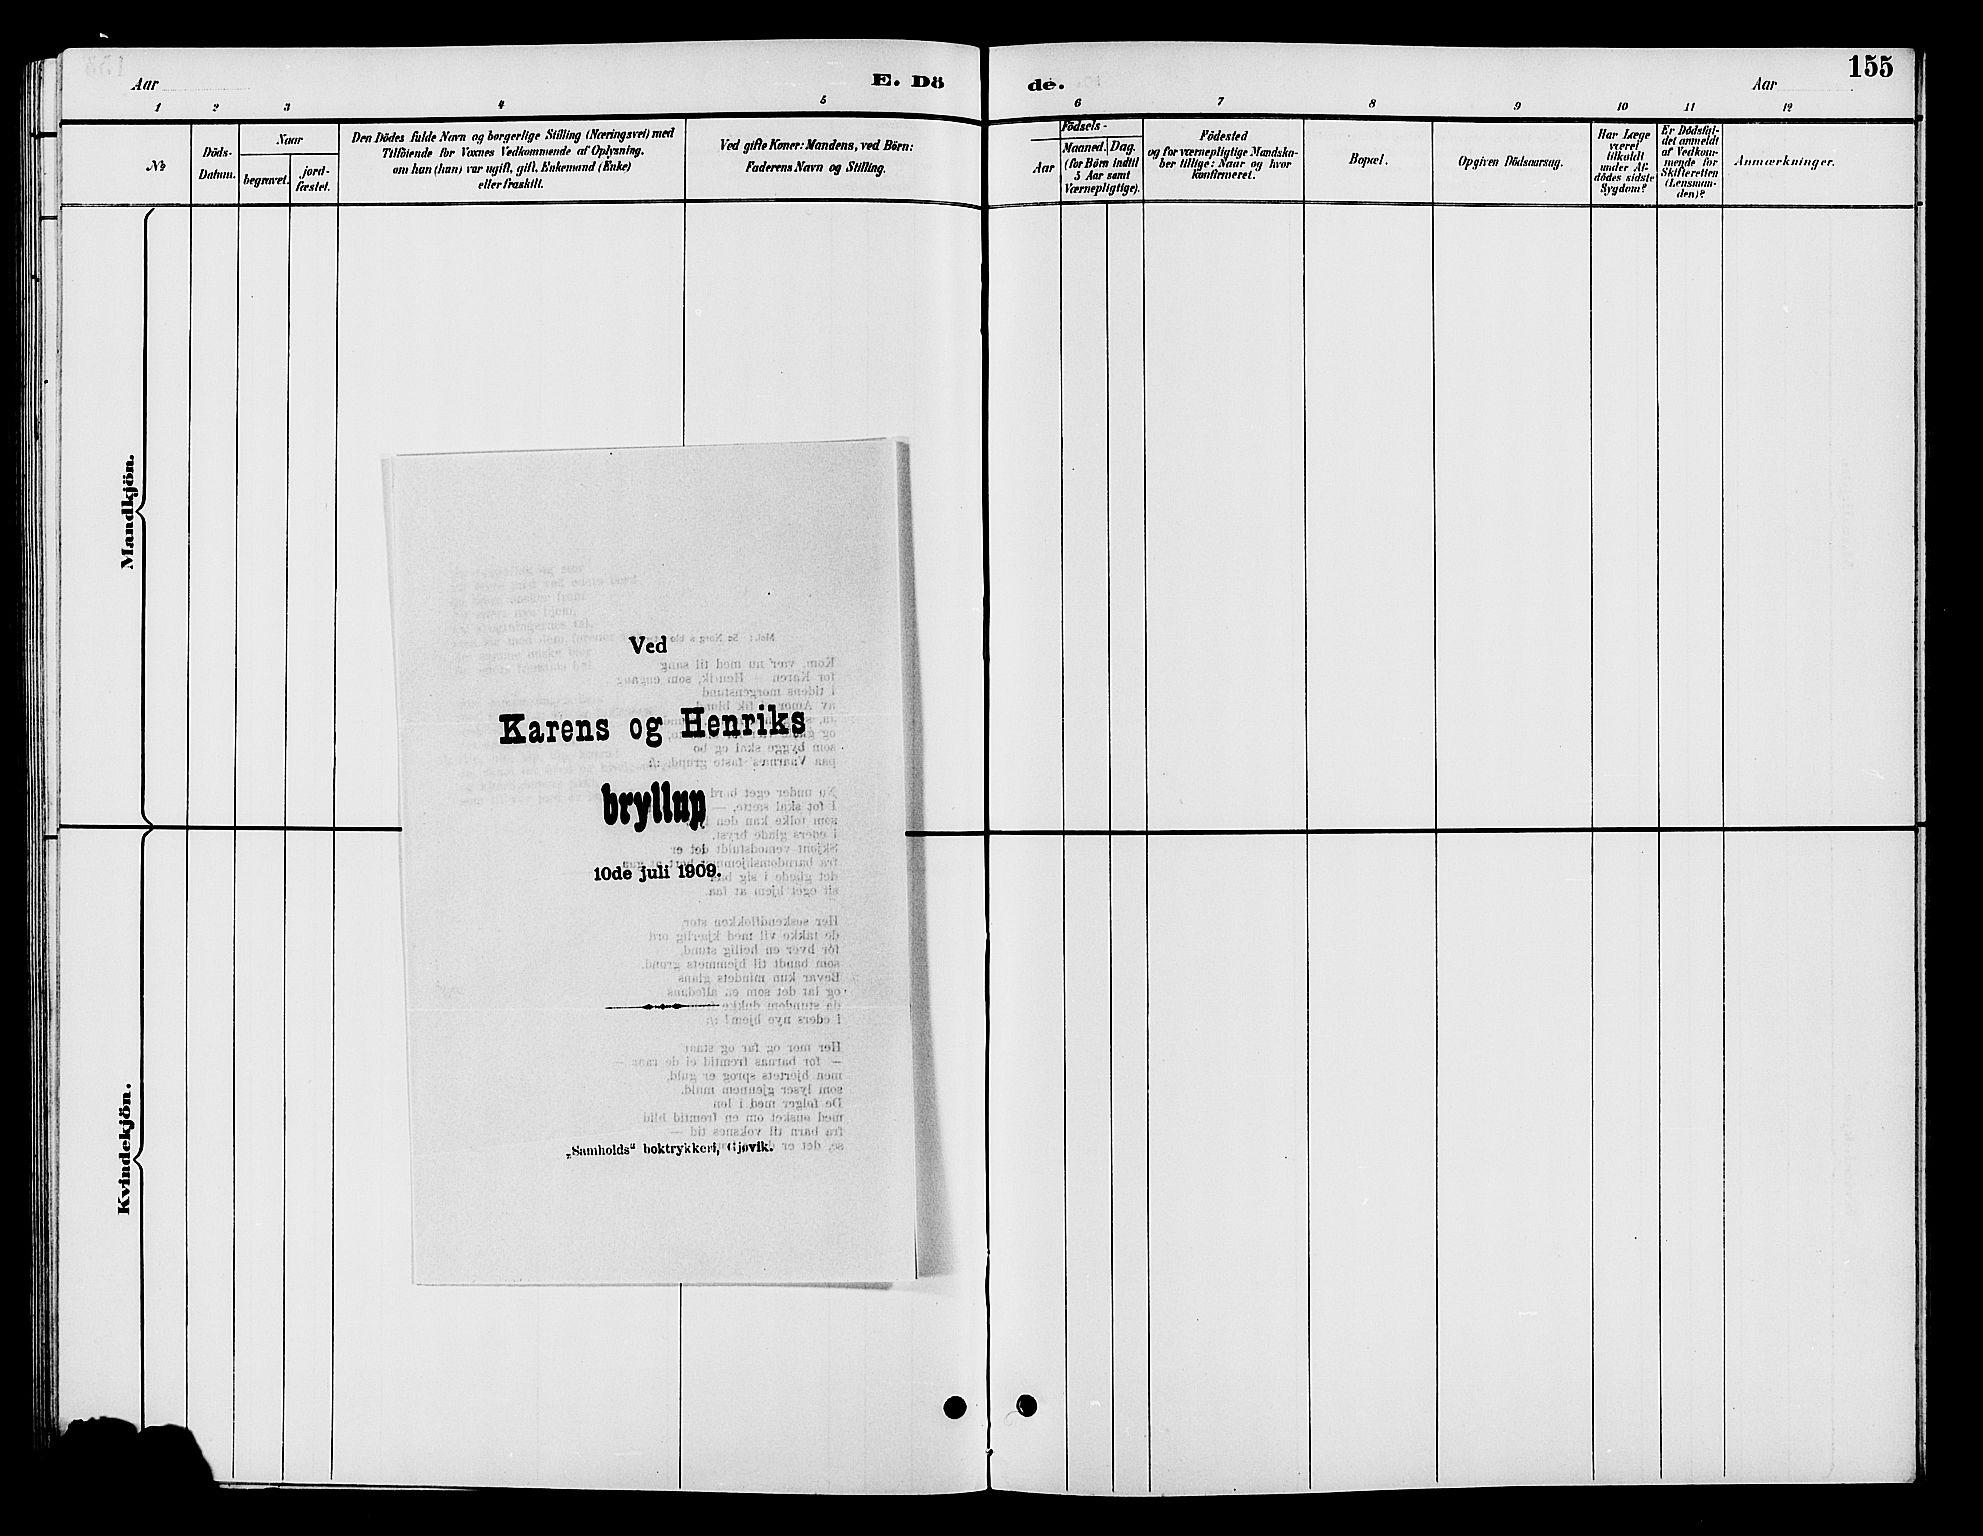 SAH, Vardal prestekontor, H/Ha/Hab/L0009: Klokkerbok nr. 9, 1894-1902, s. 155